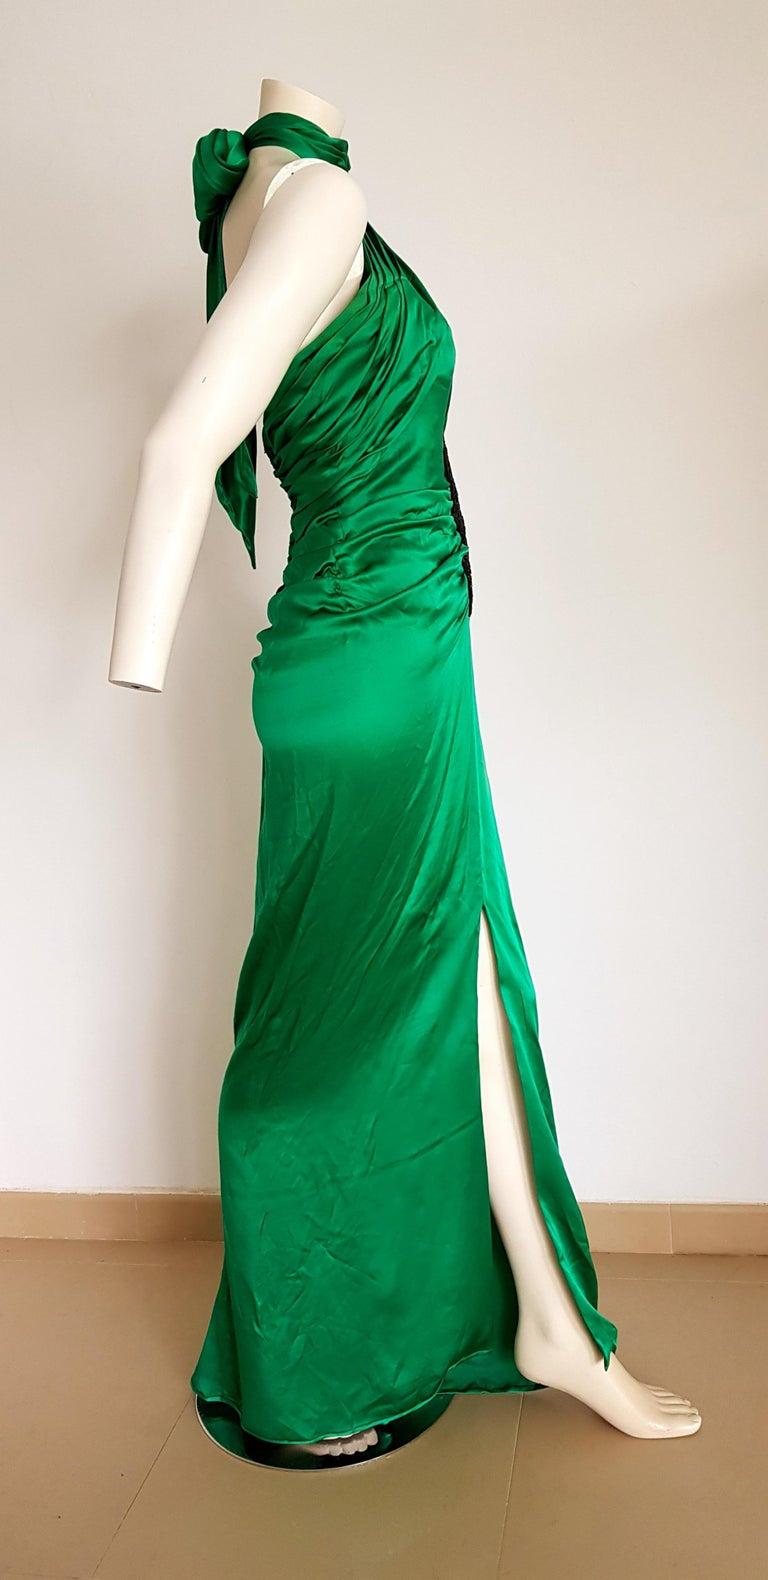 Women's VALENTINO Haute Couture Green Silk Gown Evening Dress - Unworn, New For Sale